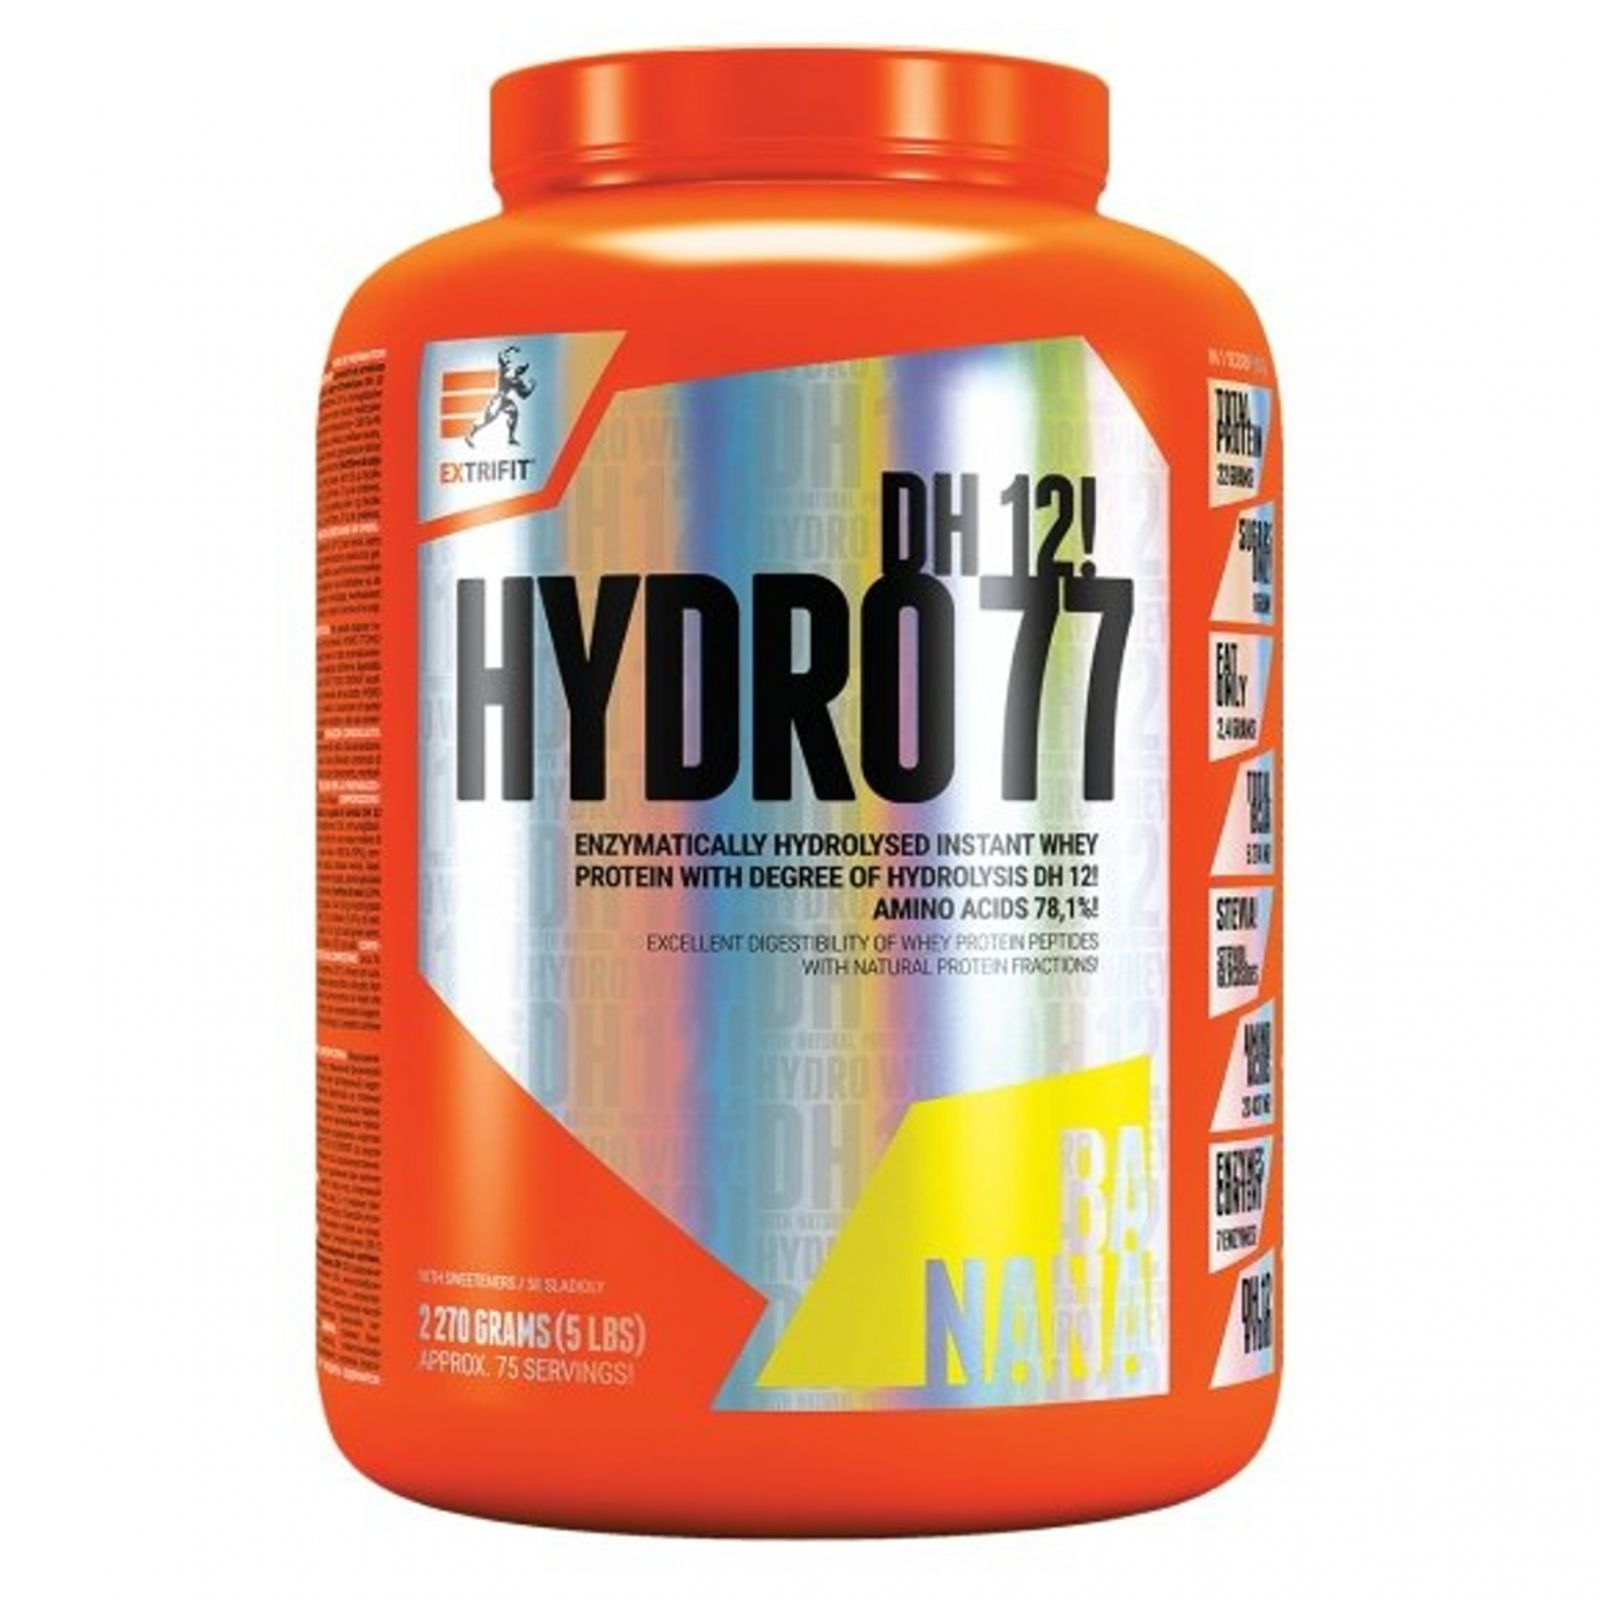 Extrifit Hydro 77 DH12 - 2270g